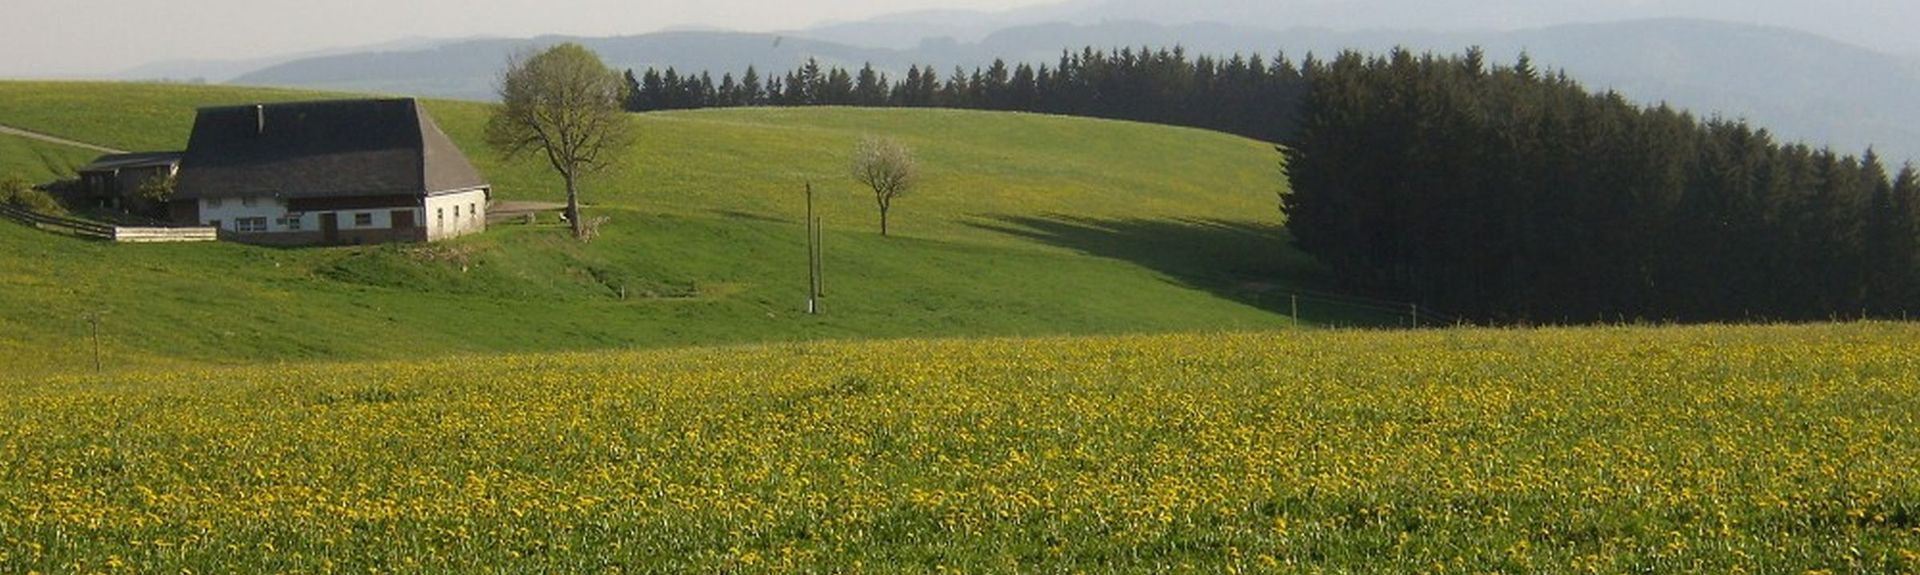 Badeparadies Schwarzwald, Titisee-Neustadt, Baden-Wuerttemberg, Duitsland